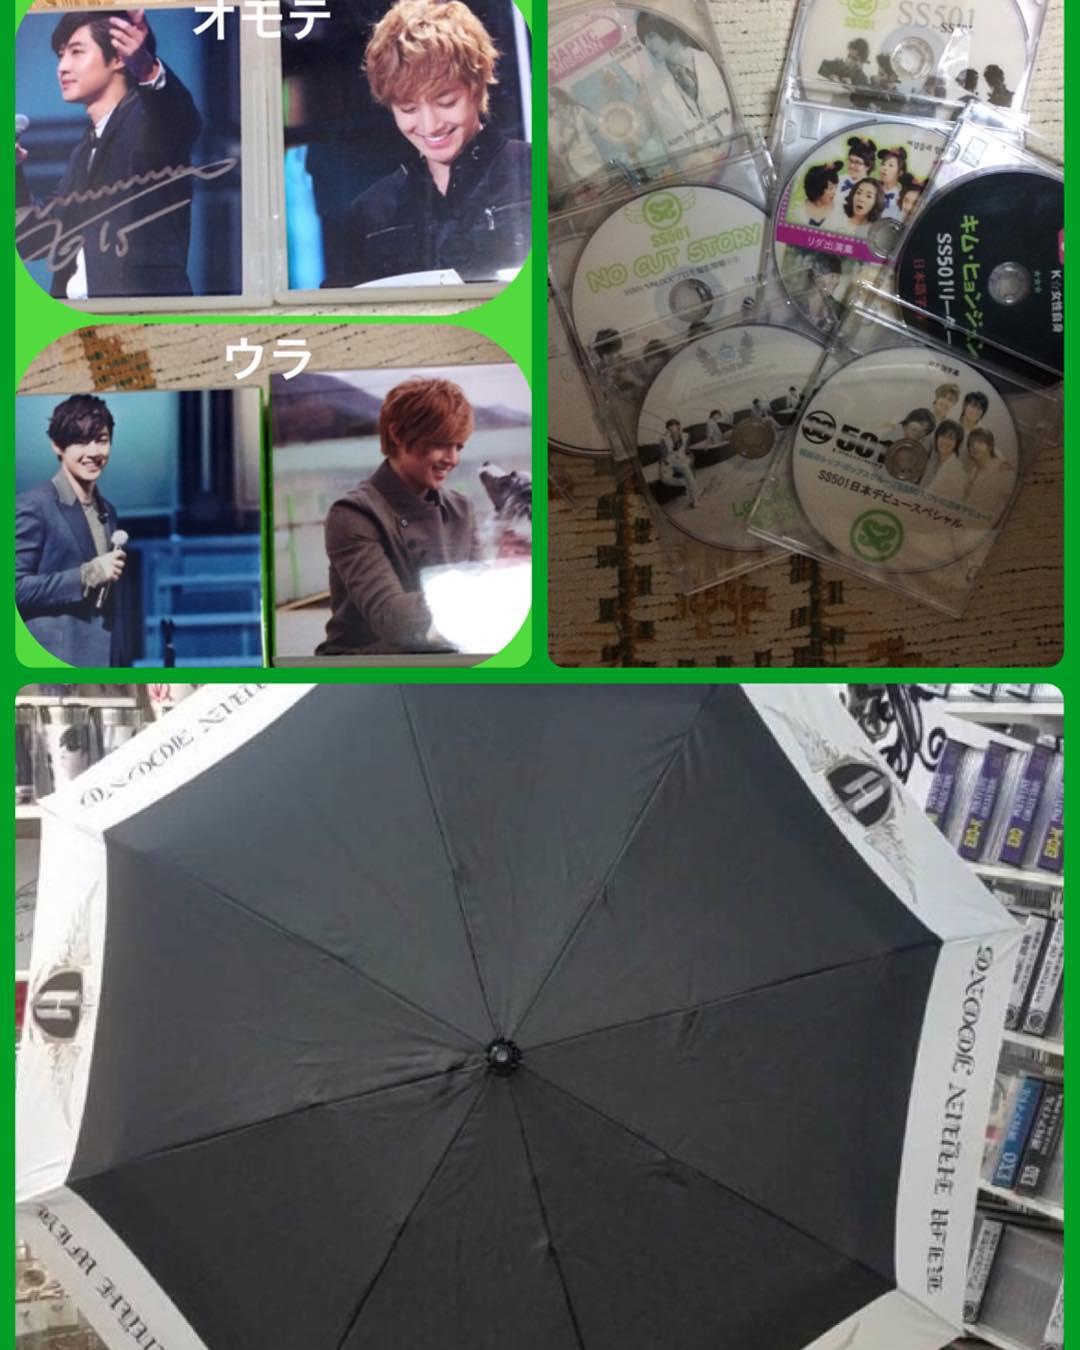 Hyun Joong Umbrella and DVD Case